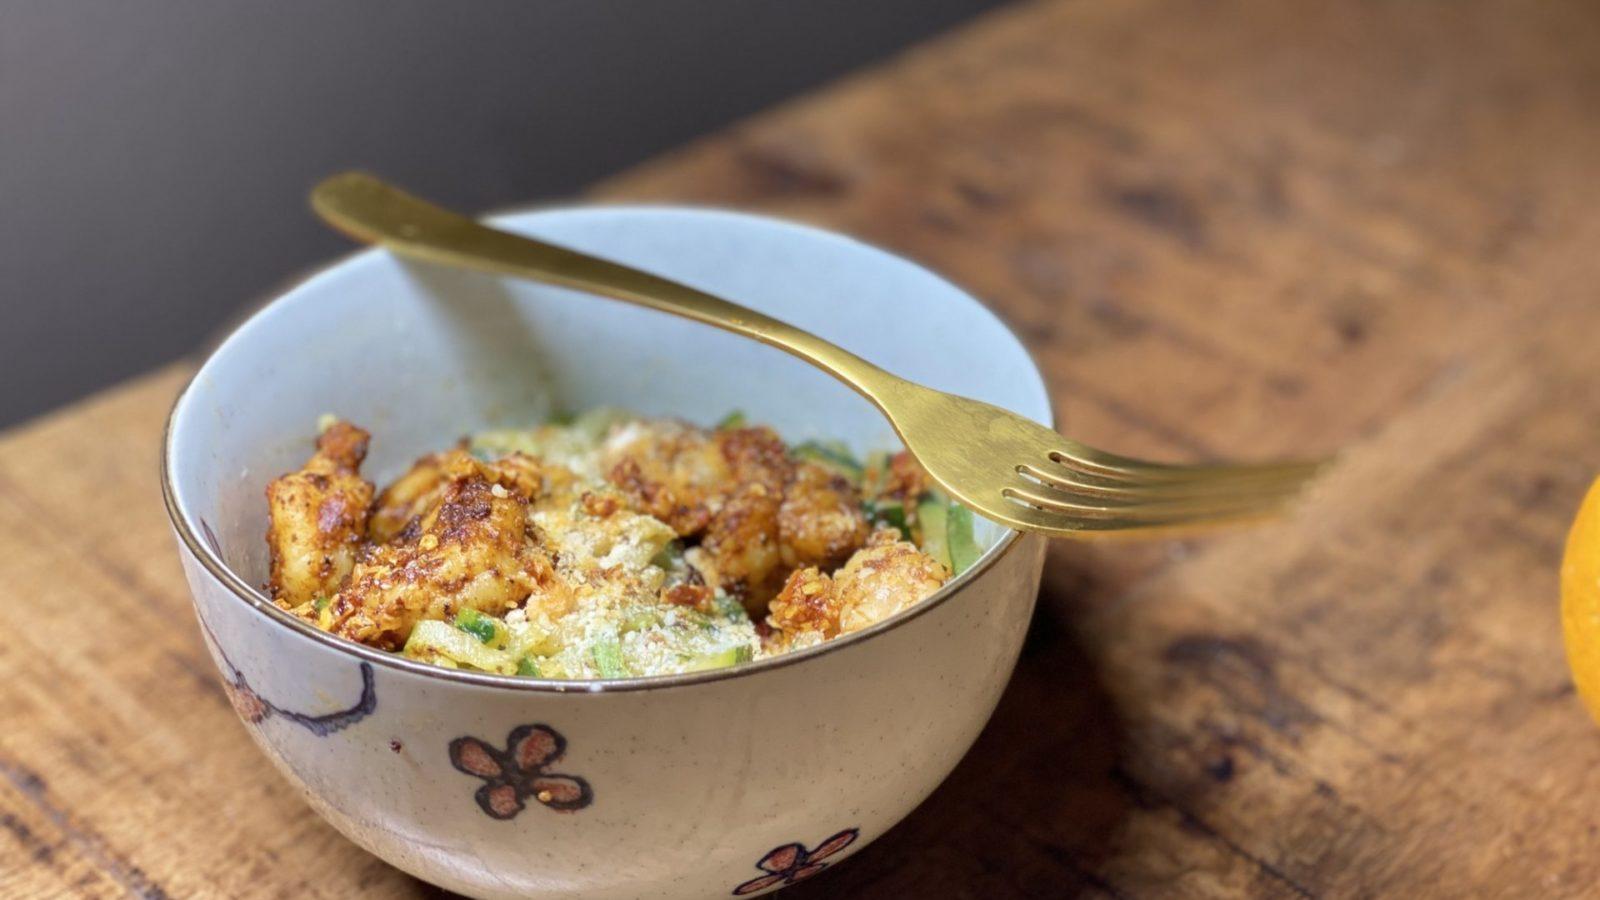 Lemon Garlic Parmesan Shrimp Zoodles - Low Carb, Keto, Thm Friendly 2